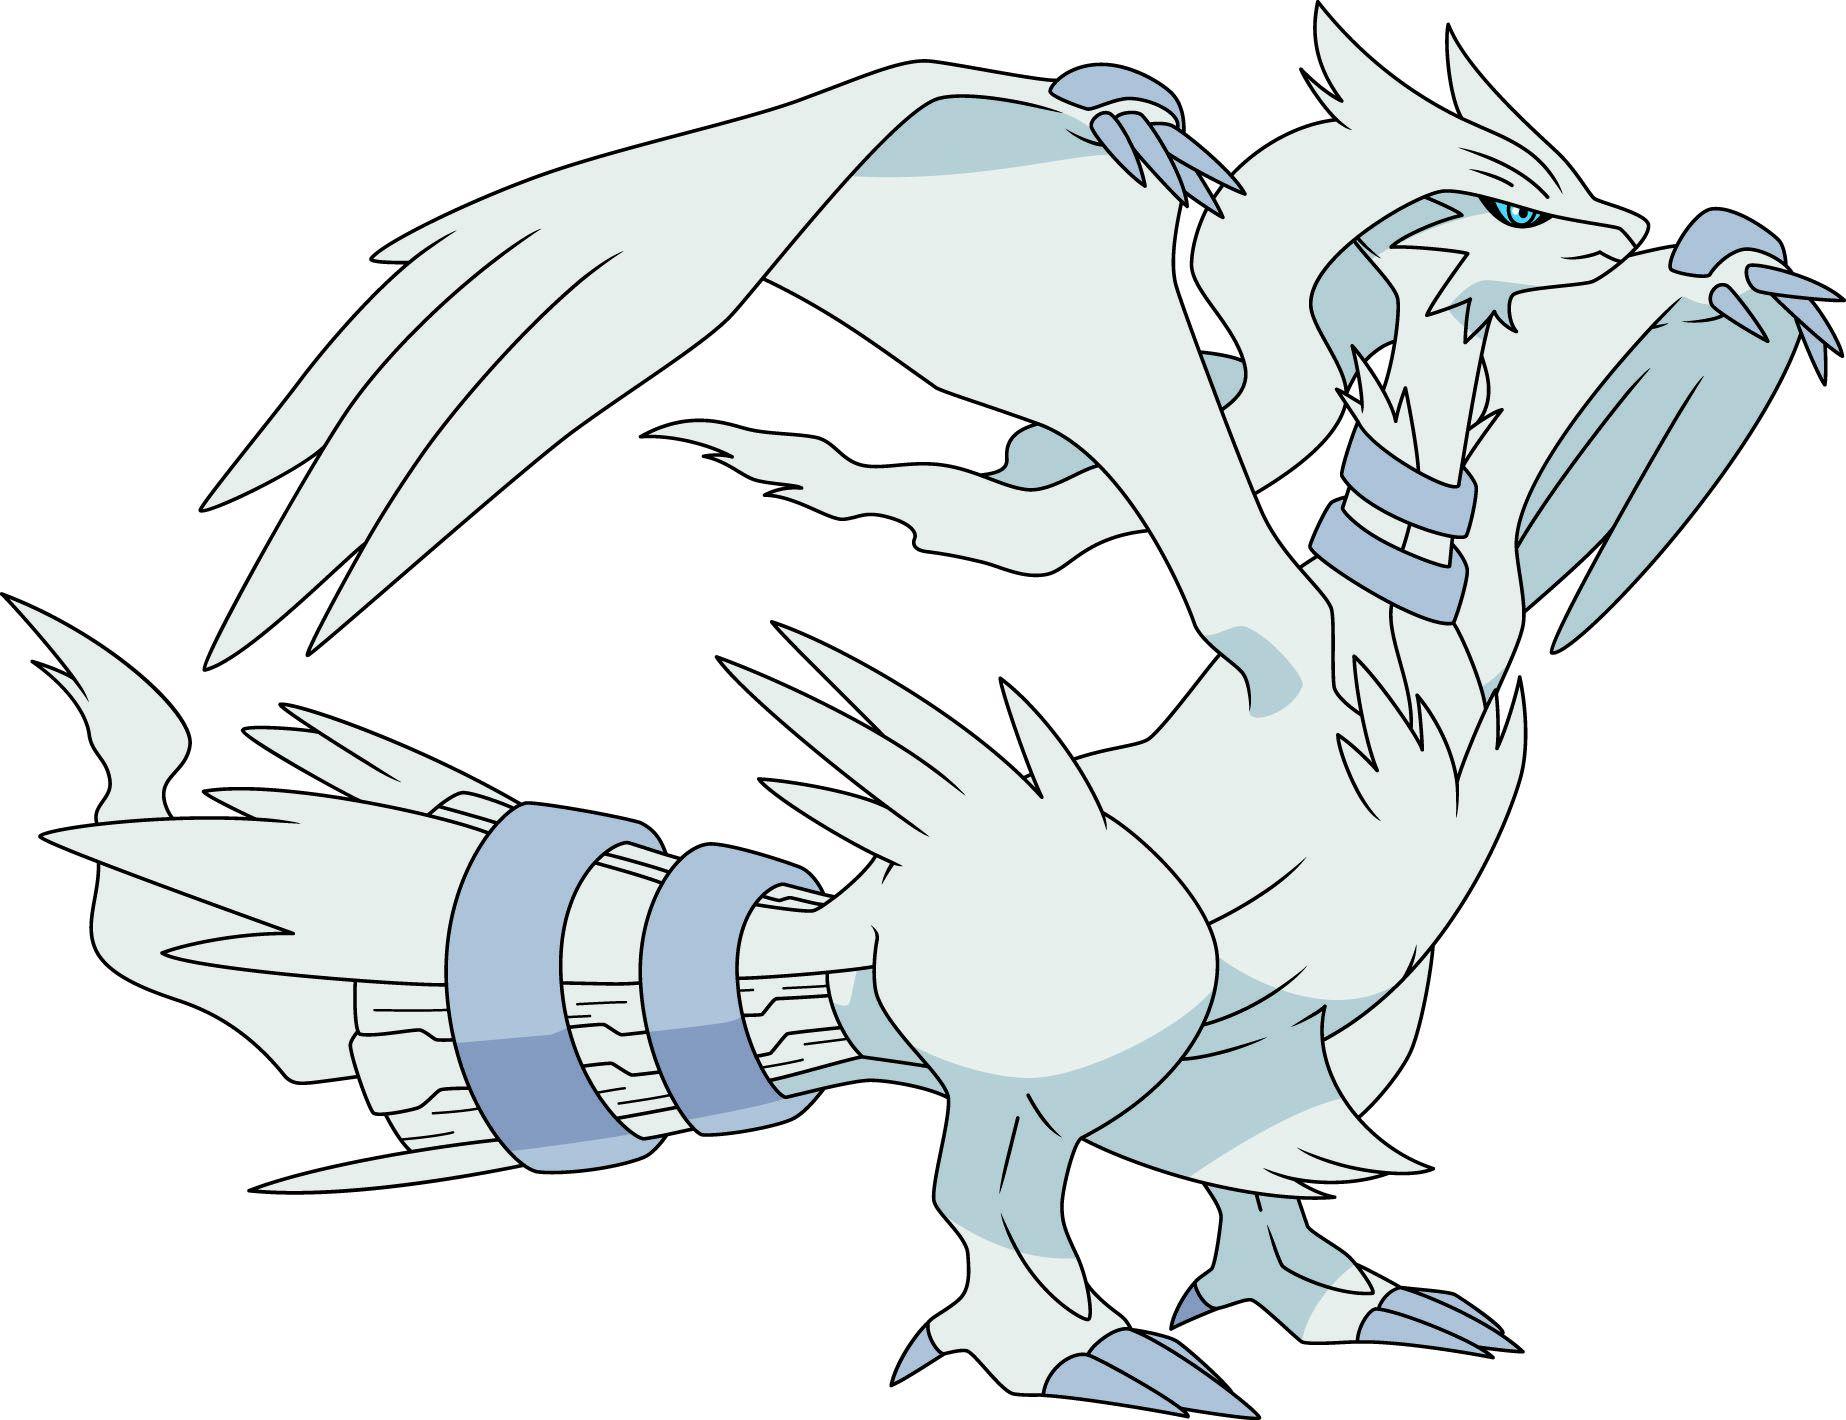 Using Form-Changing Pokemon in Pokemon ORAS Part 2